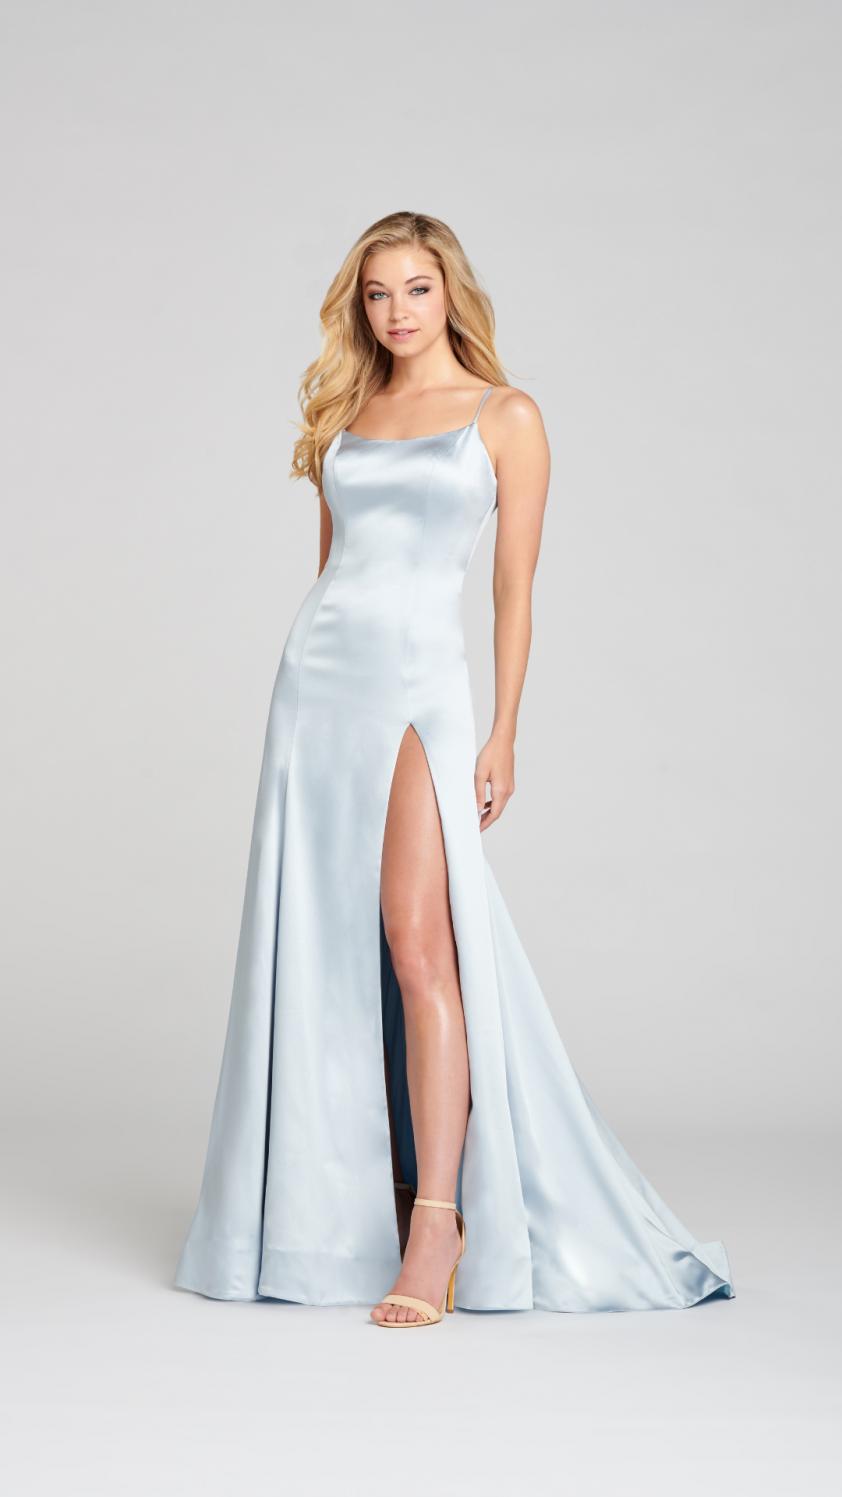 Wedding Dress - Dominique Levesque Bridal